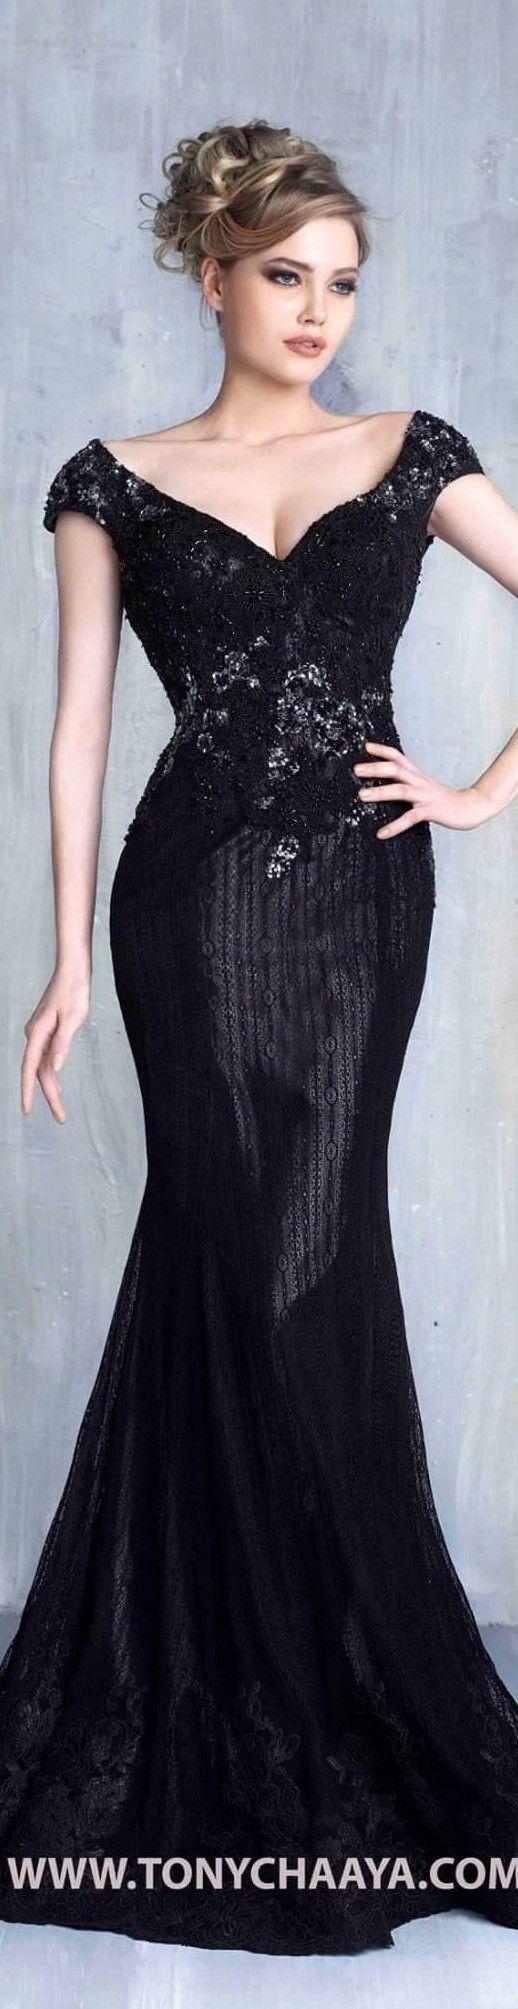 Tony Chaaya Couture 2016 Women Fashion Outfit Clothing